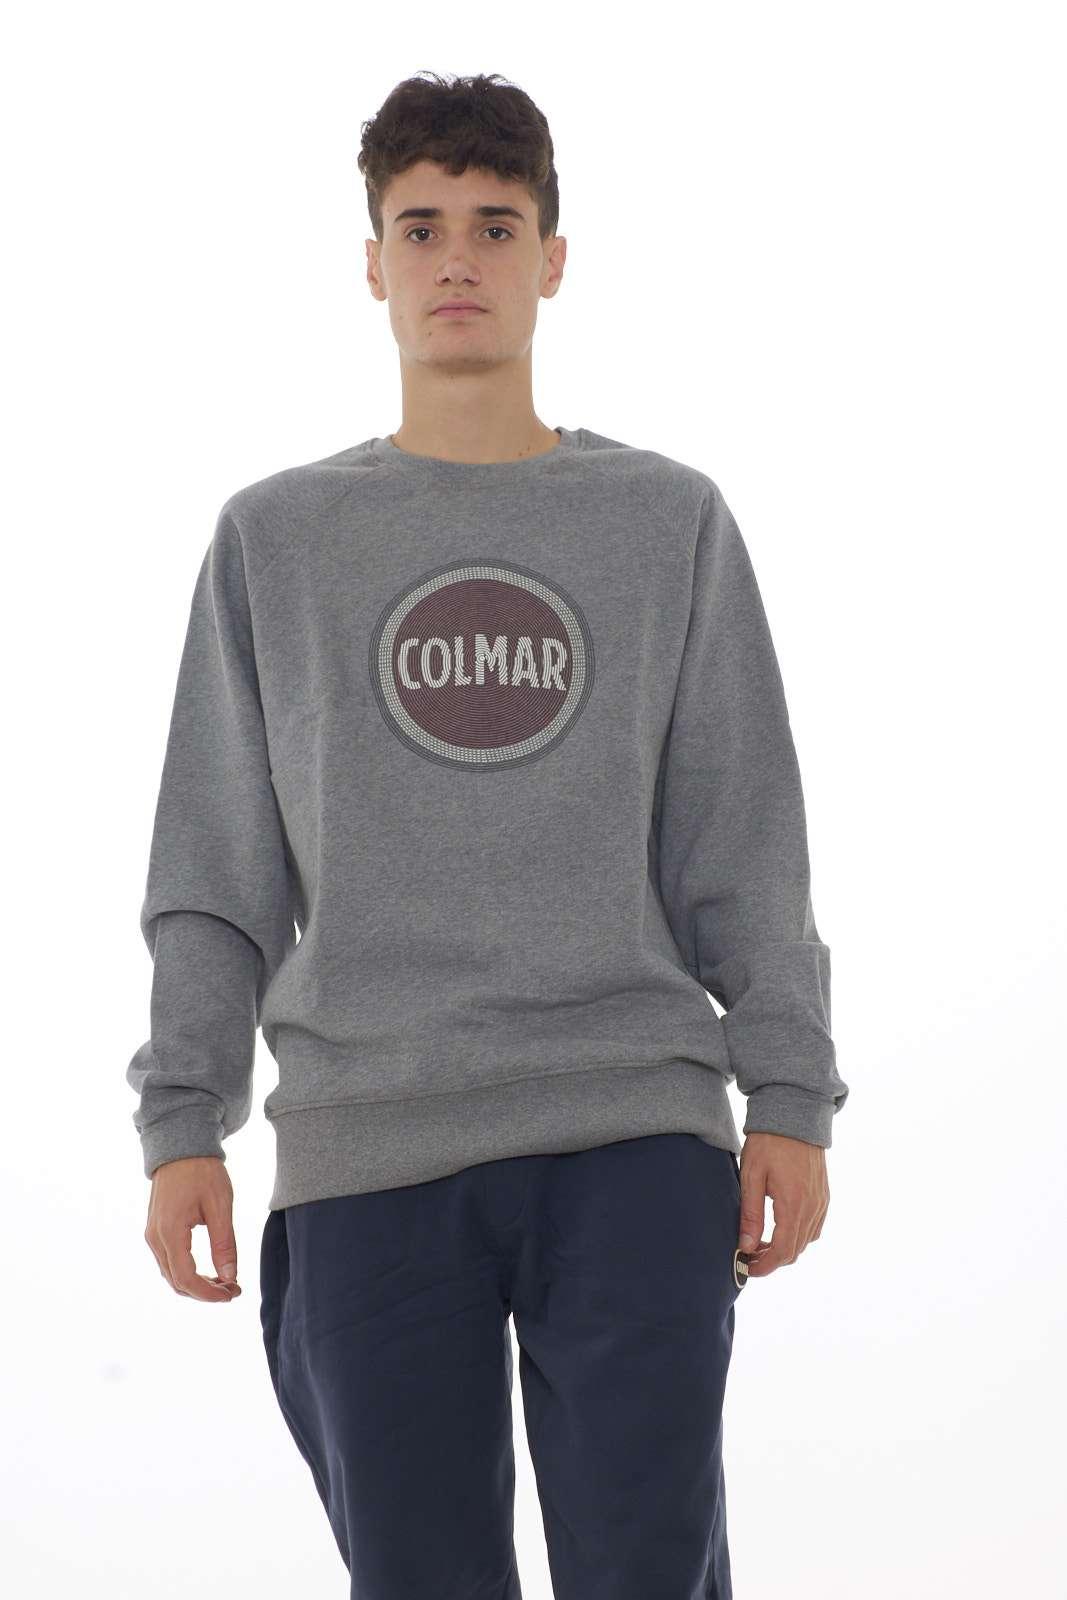 https://www.parmax.com/media/catalog/product/a/i/AI-outlet_parmax-felpa-uomo-Colmar-8268r-B.jpg